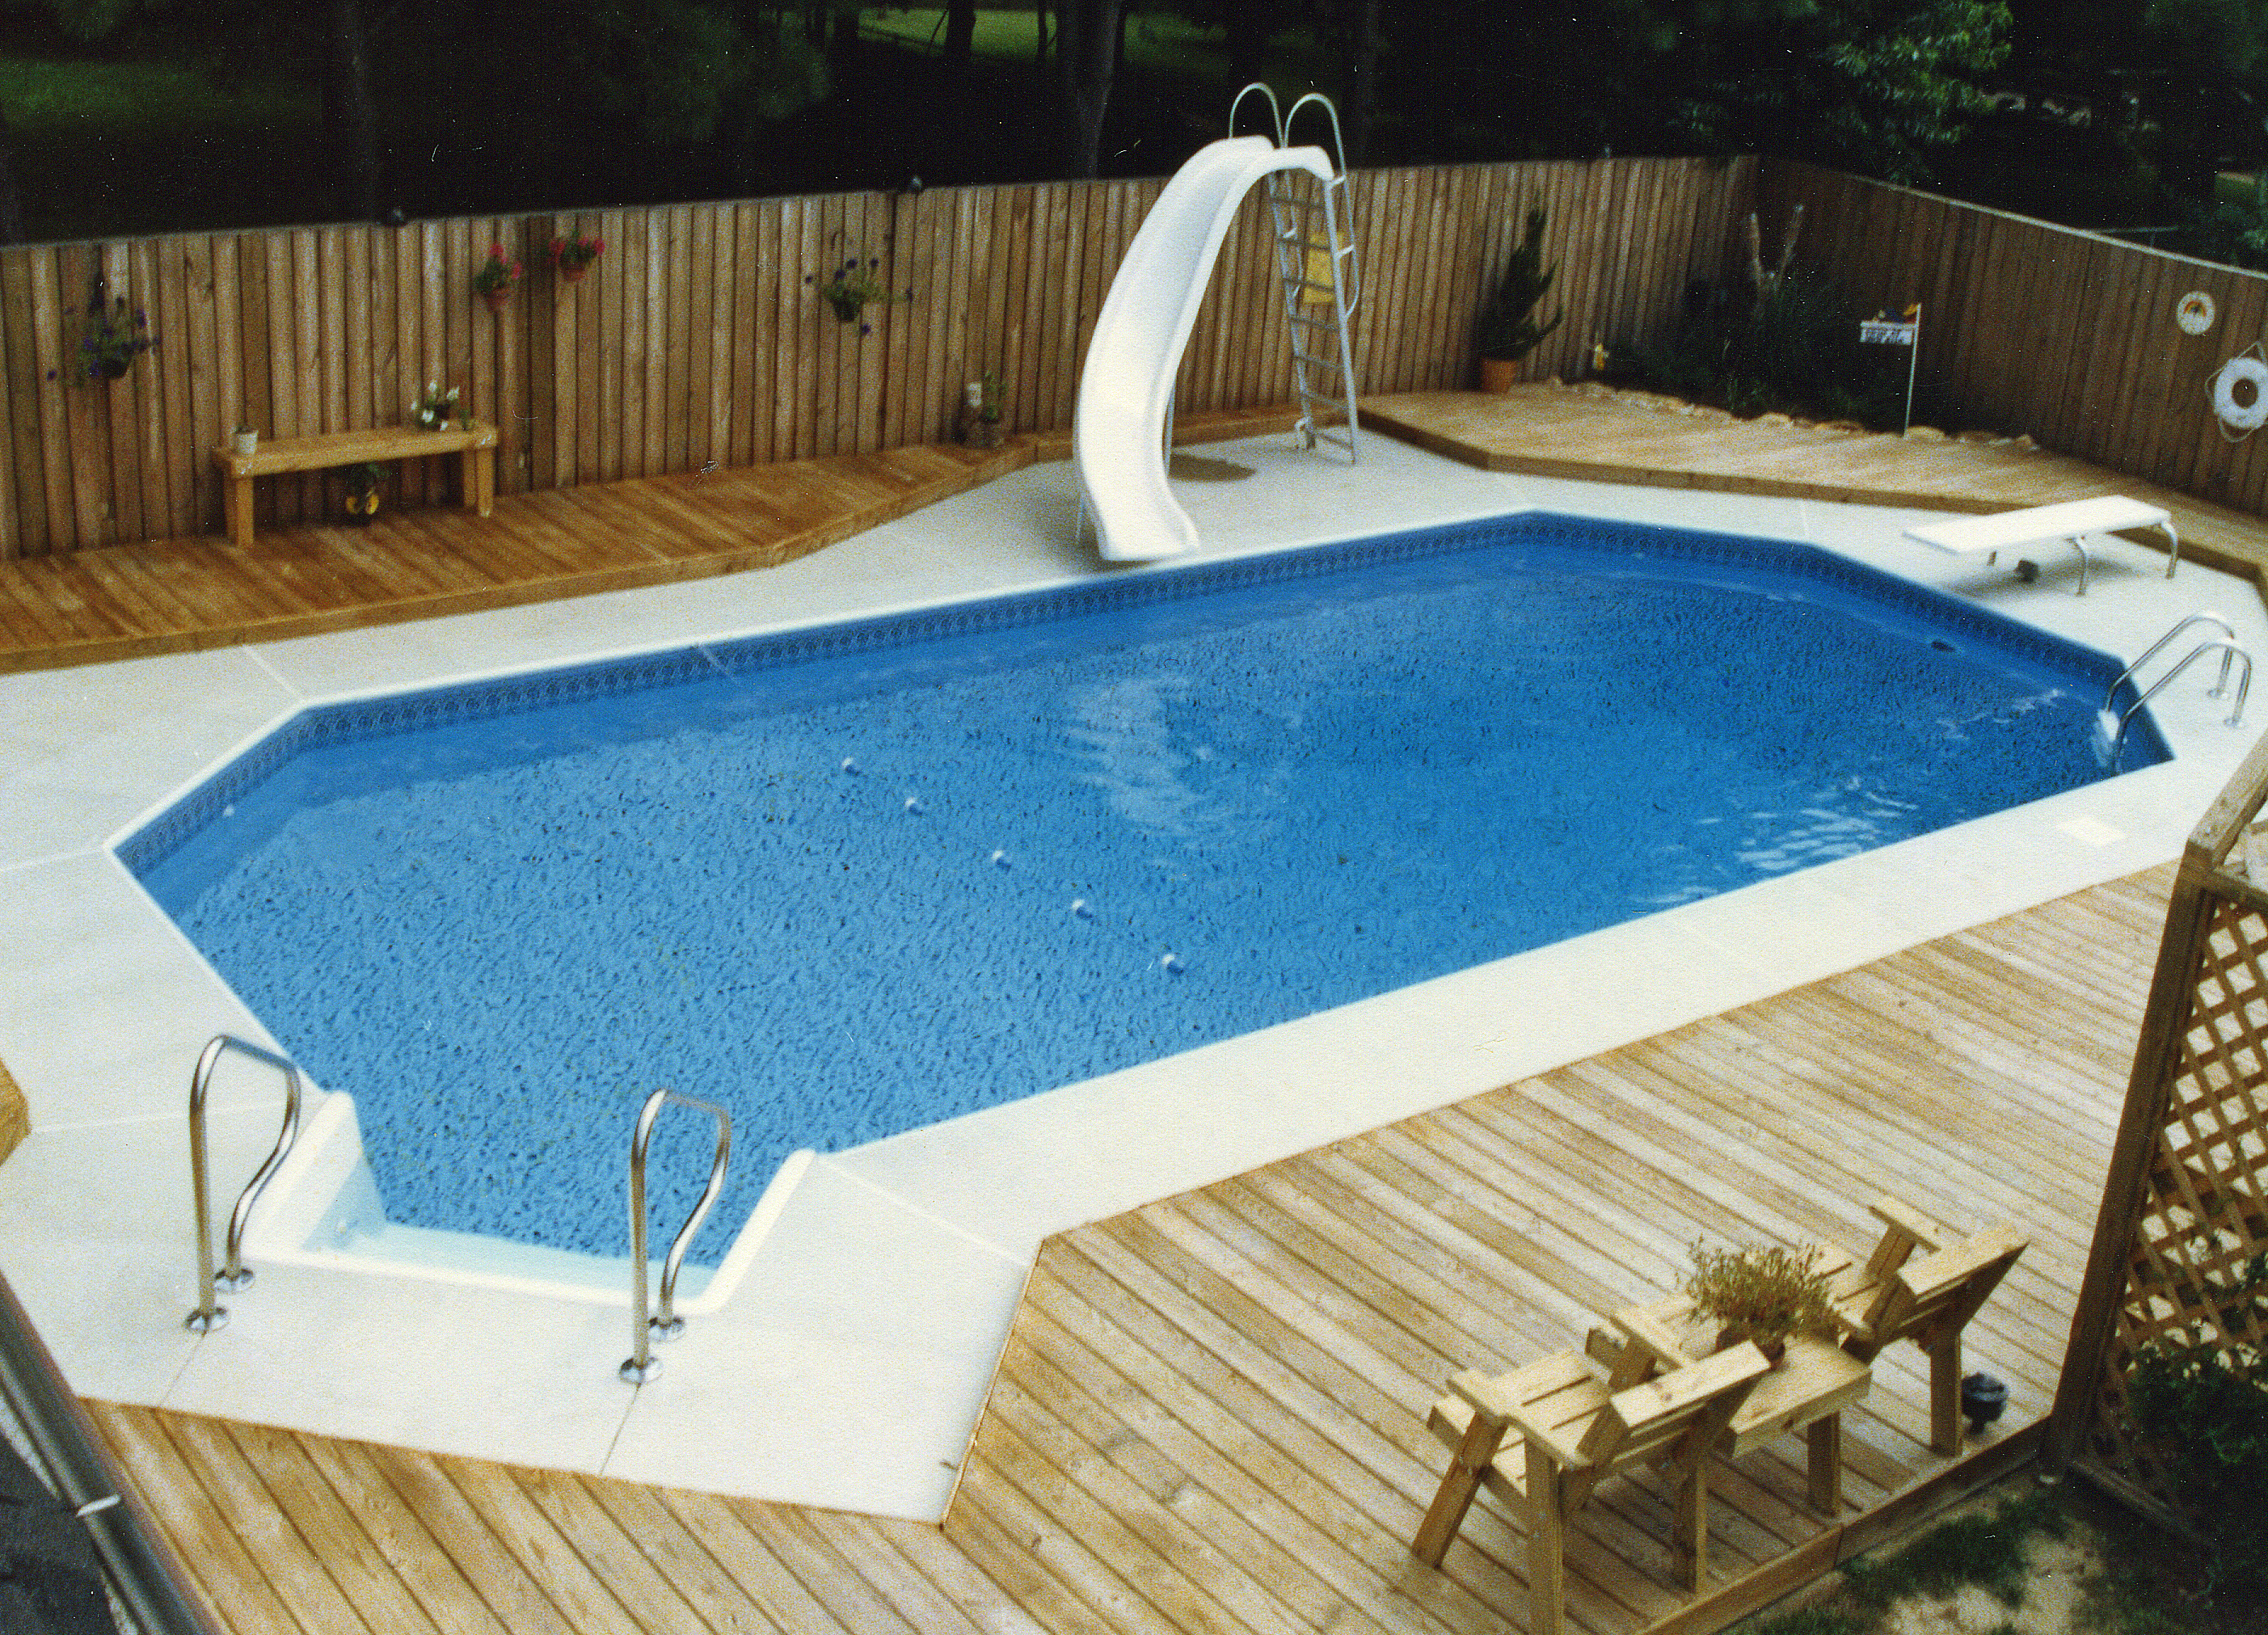 Grecian liner pool 5